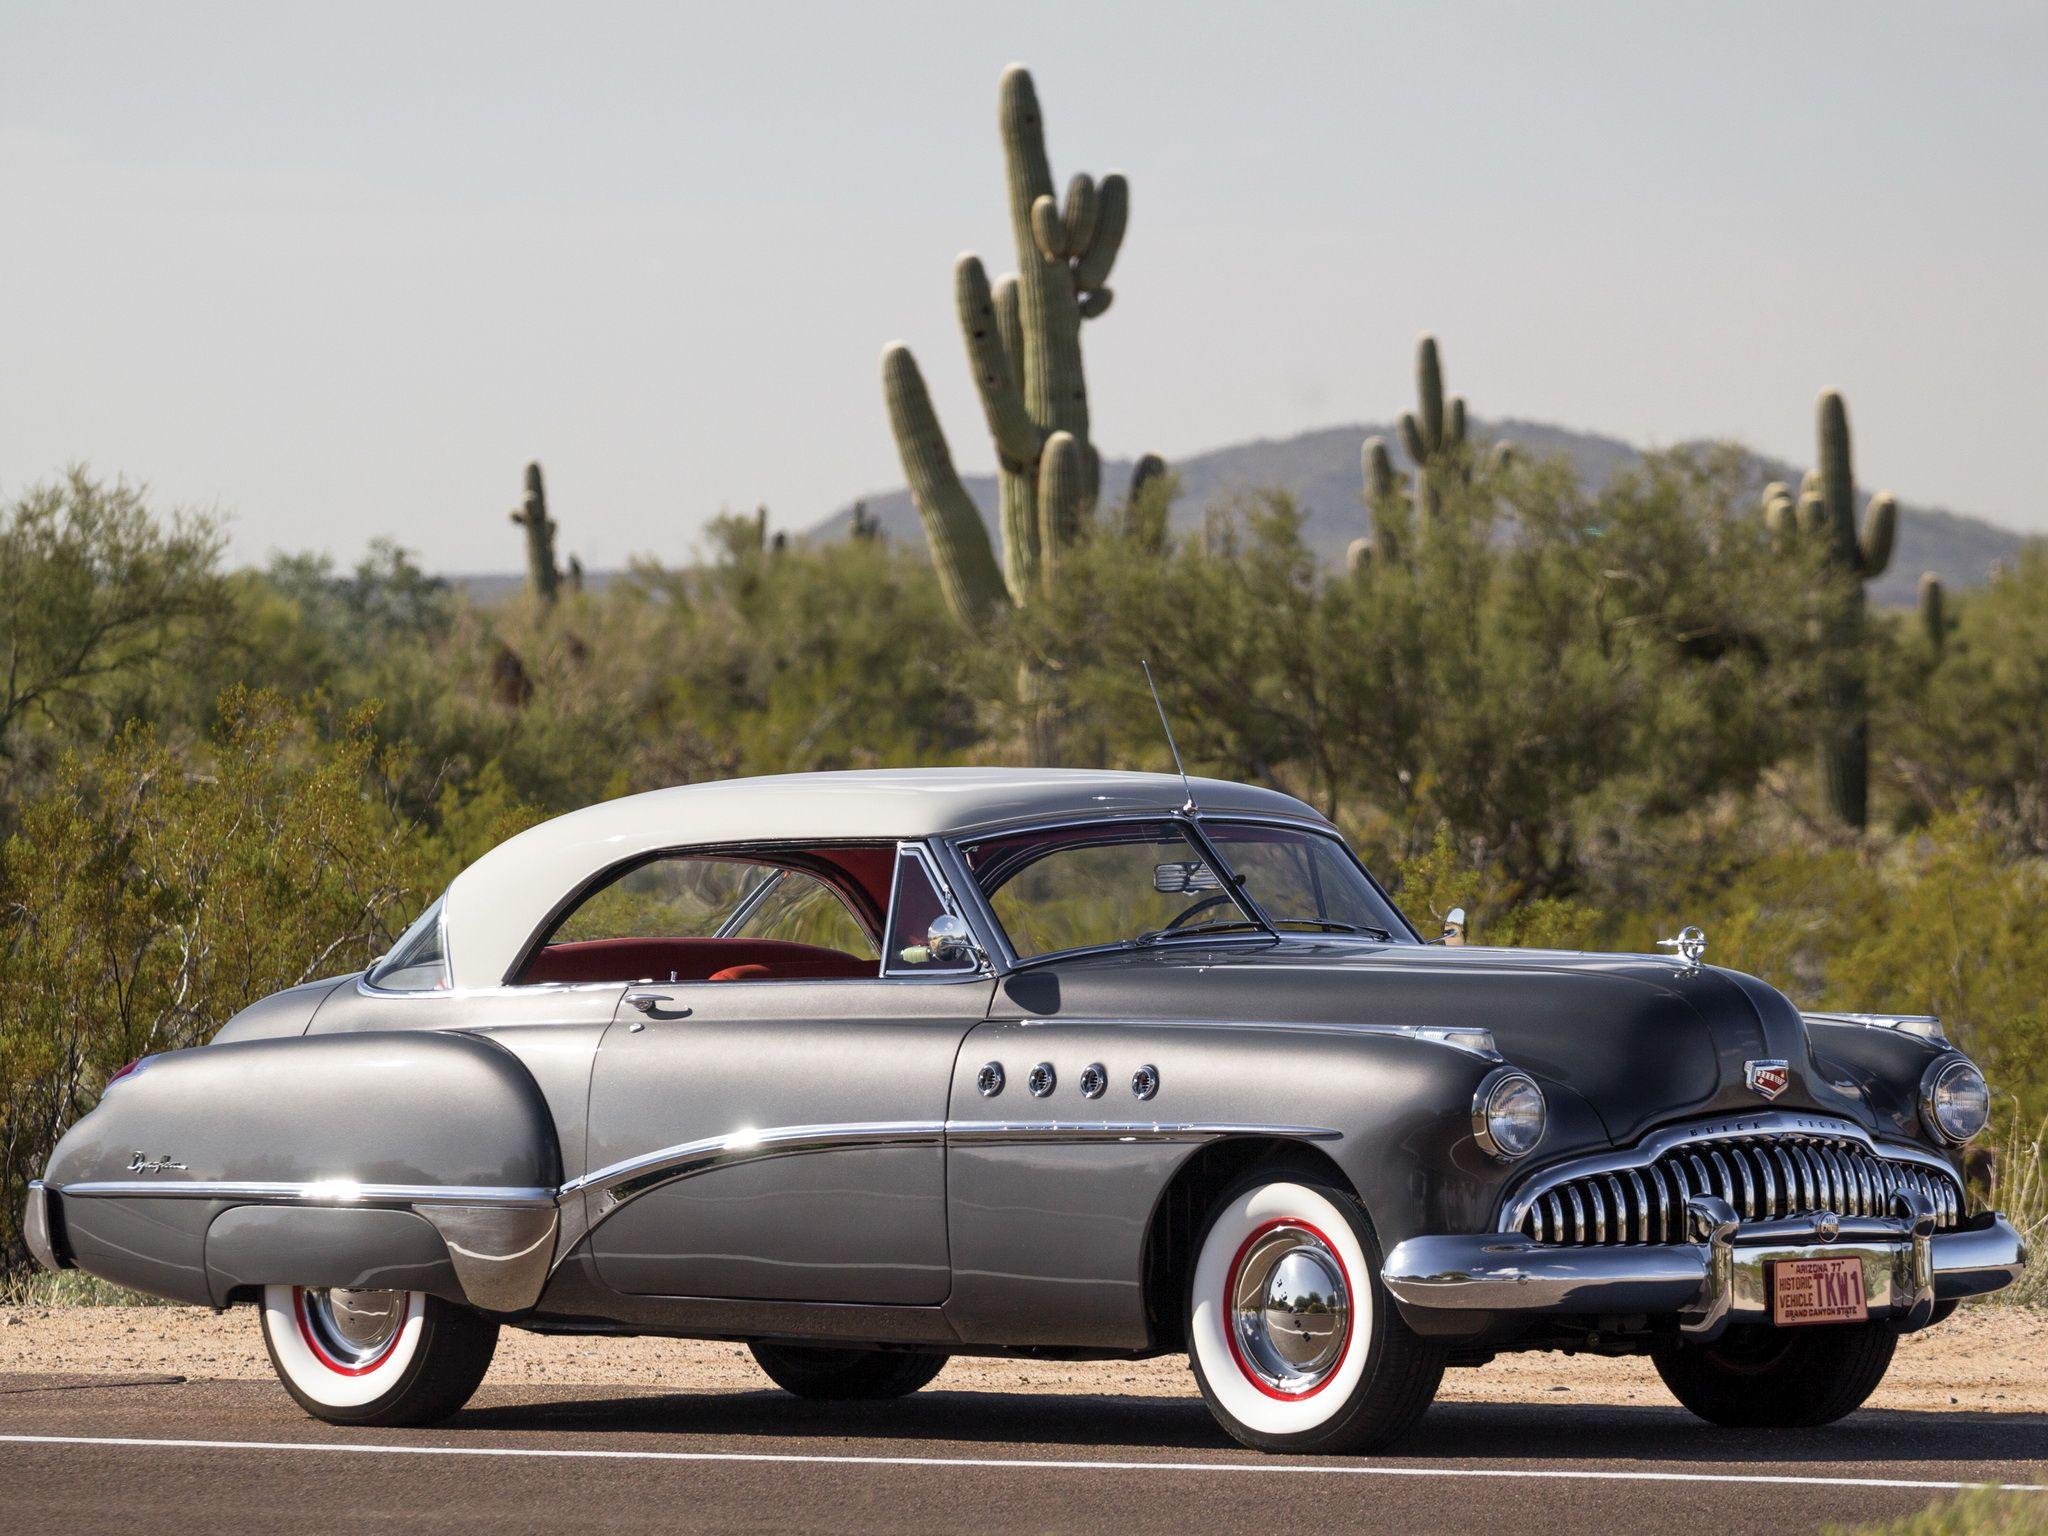 1949 Buick Roadmaster Riviera - (Buick Motor Car Company, Flint ...